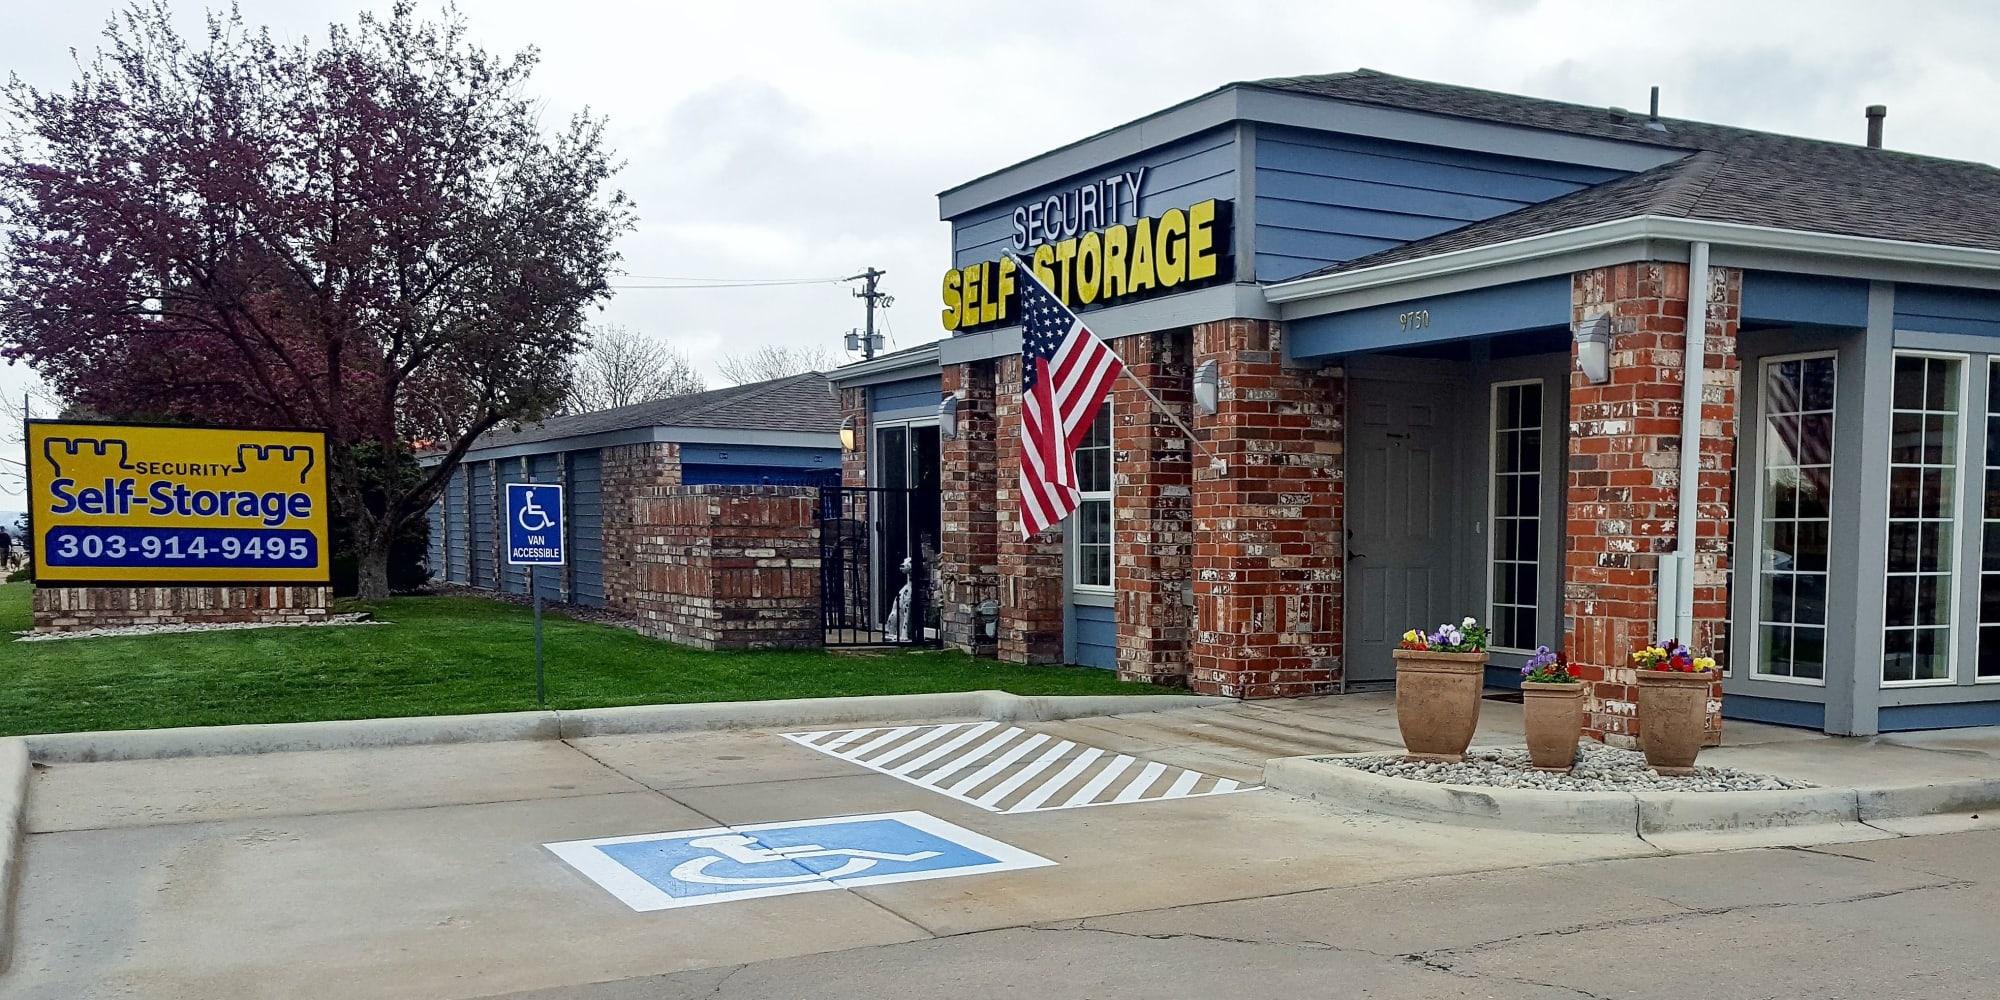 Self storage in Lakewood CO